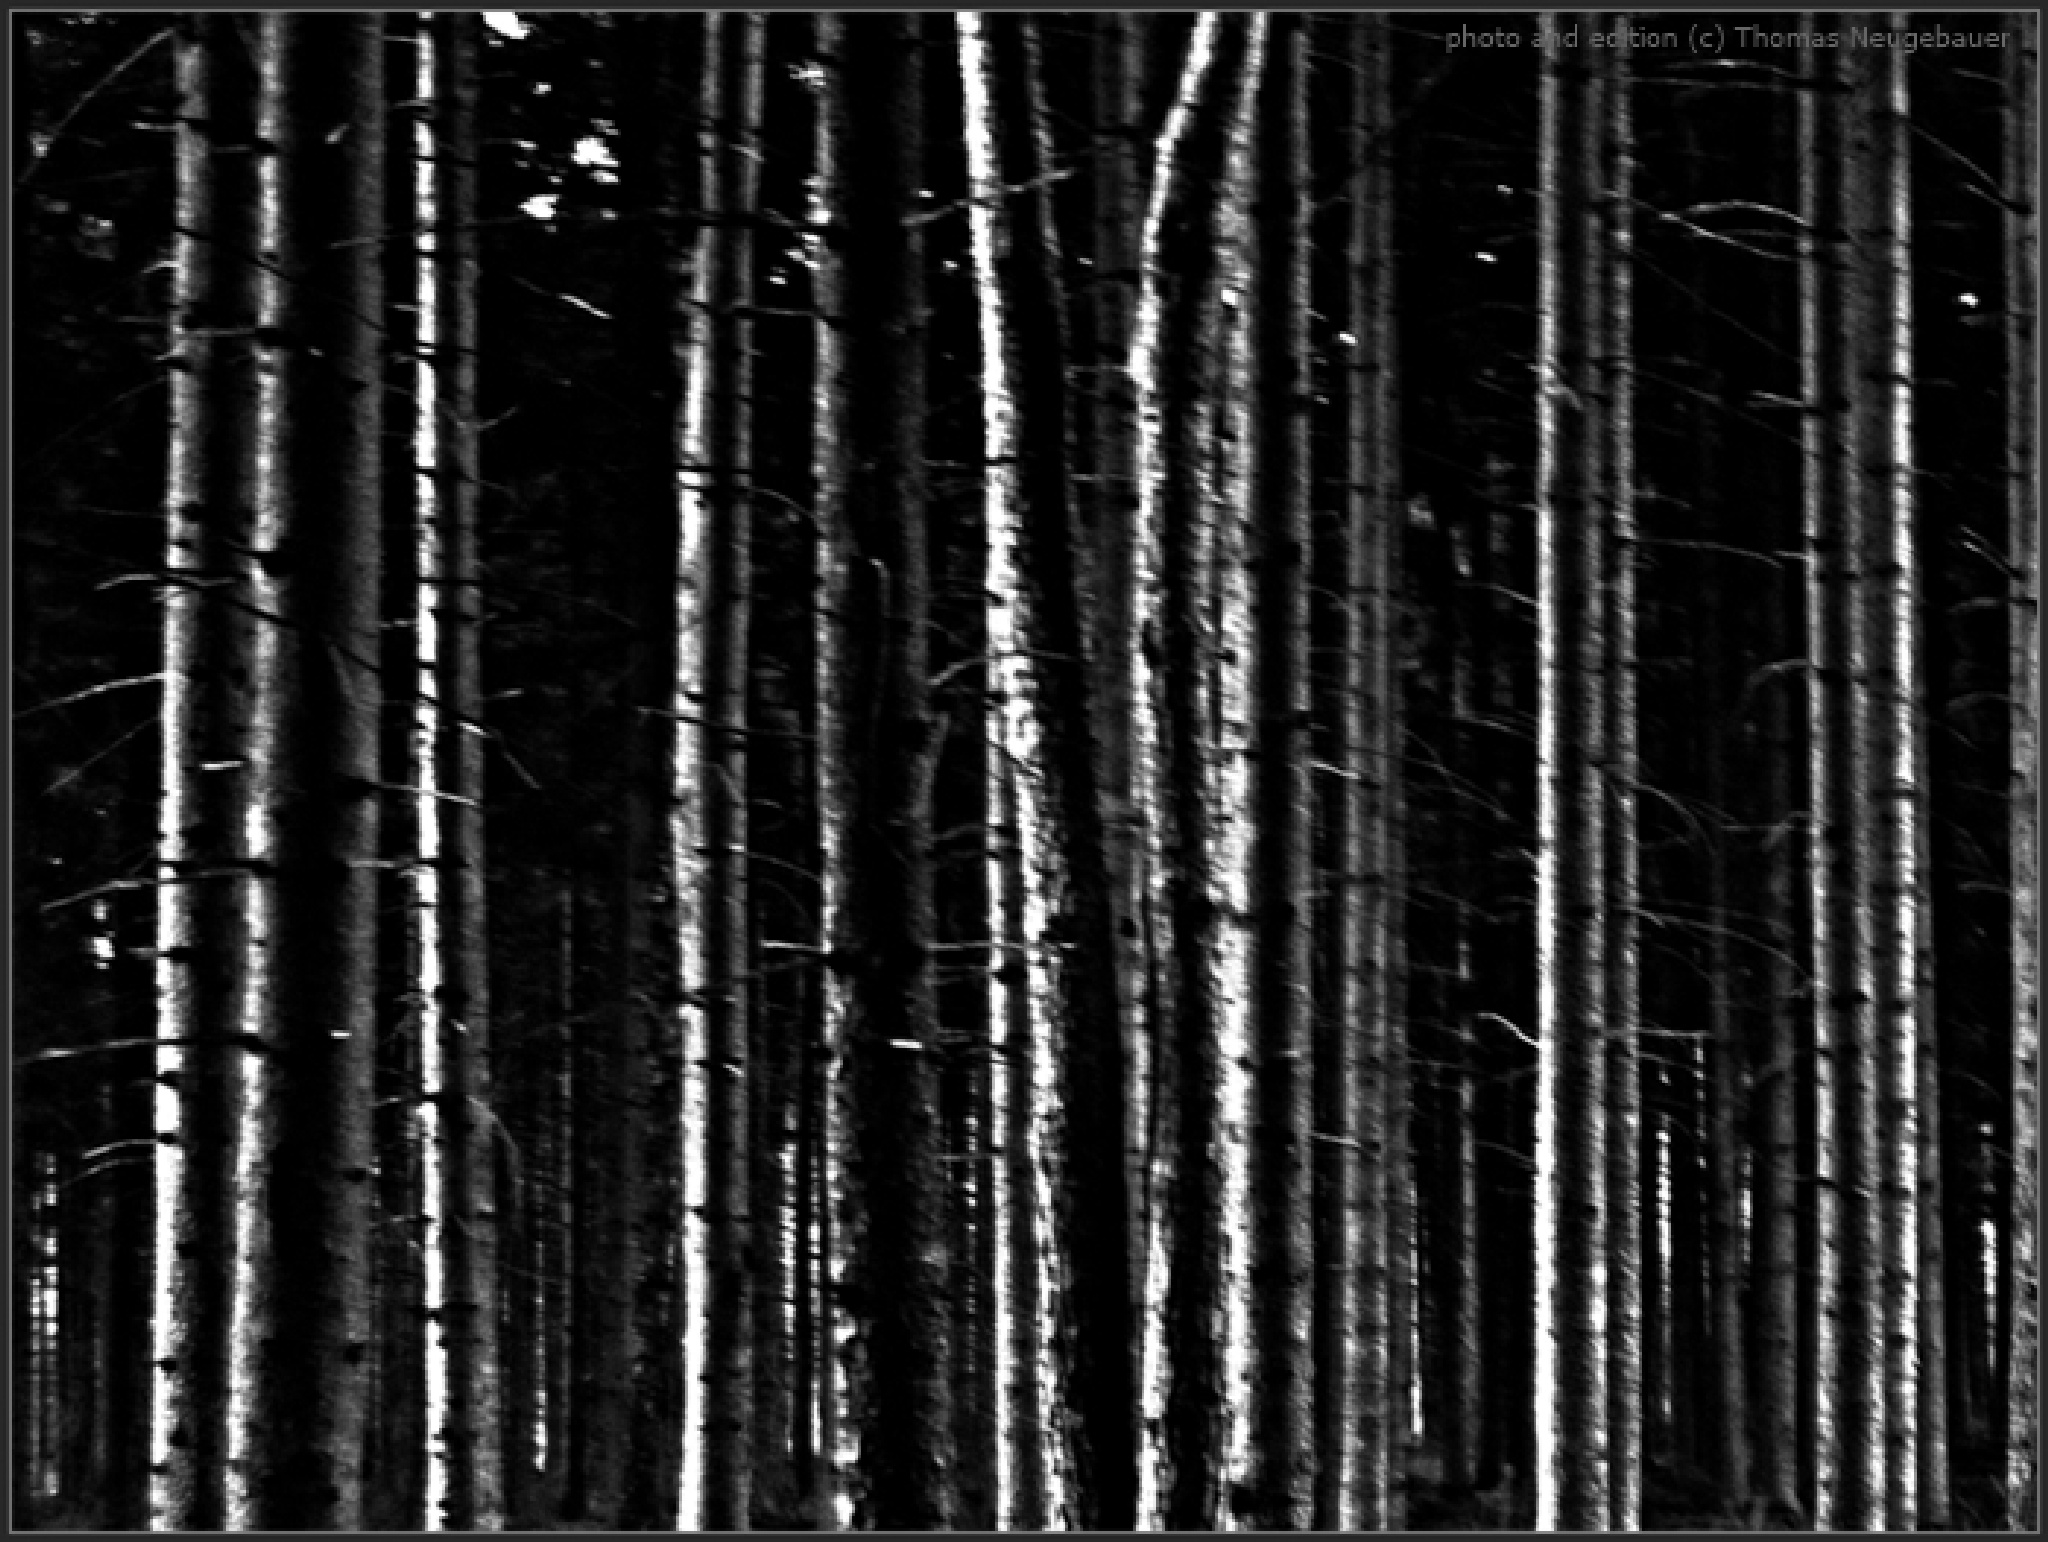 # 602 by Thomas Neugebauer